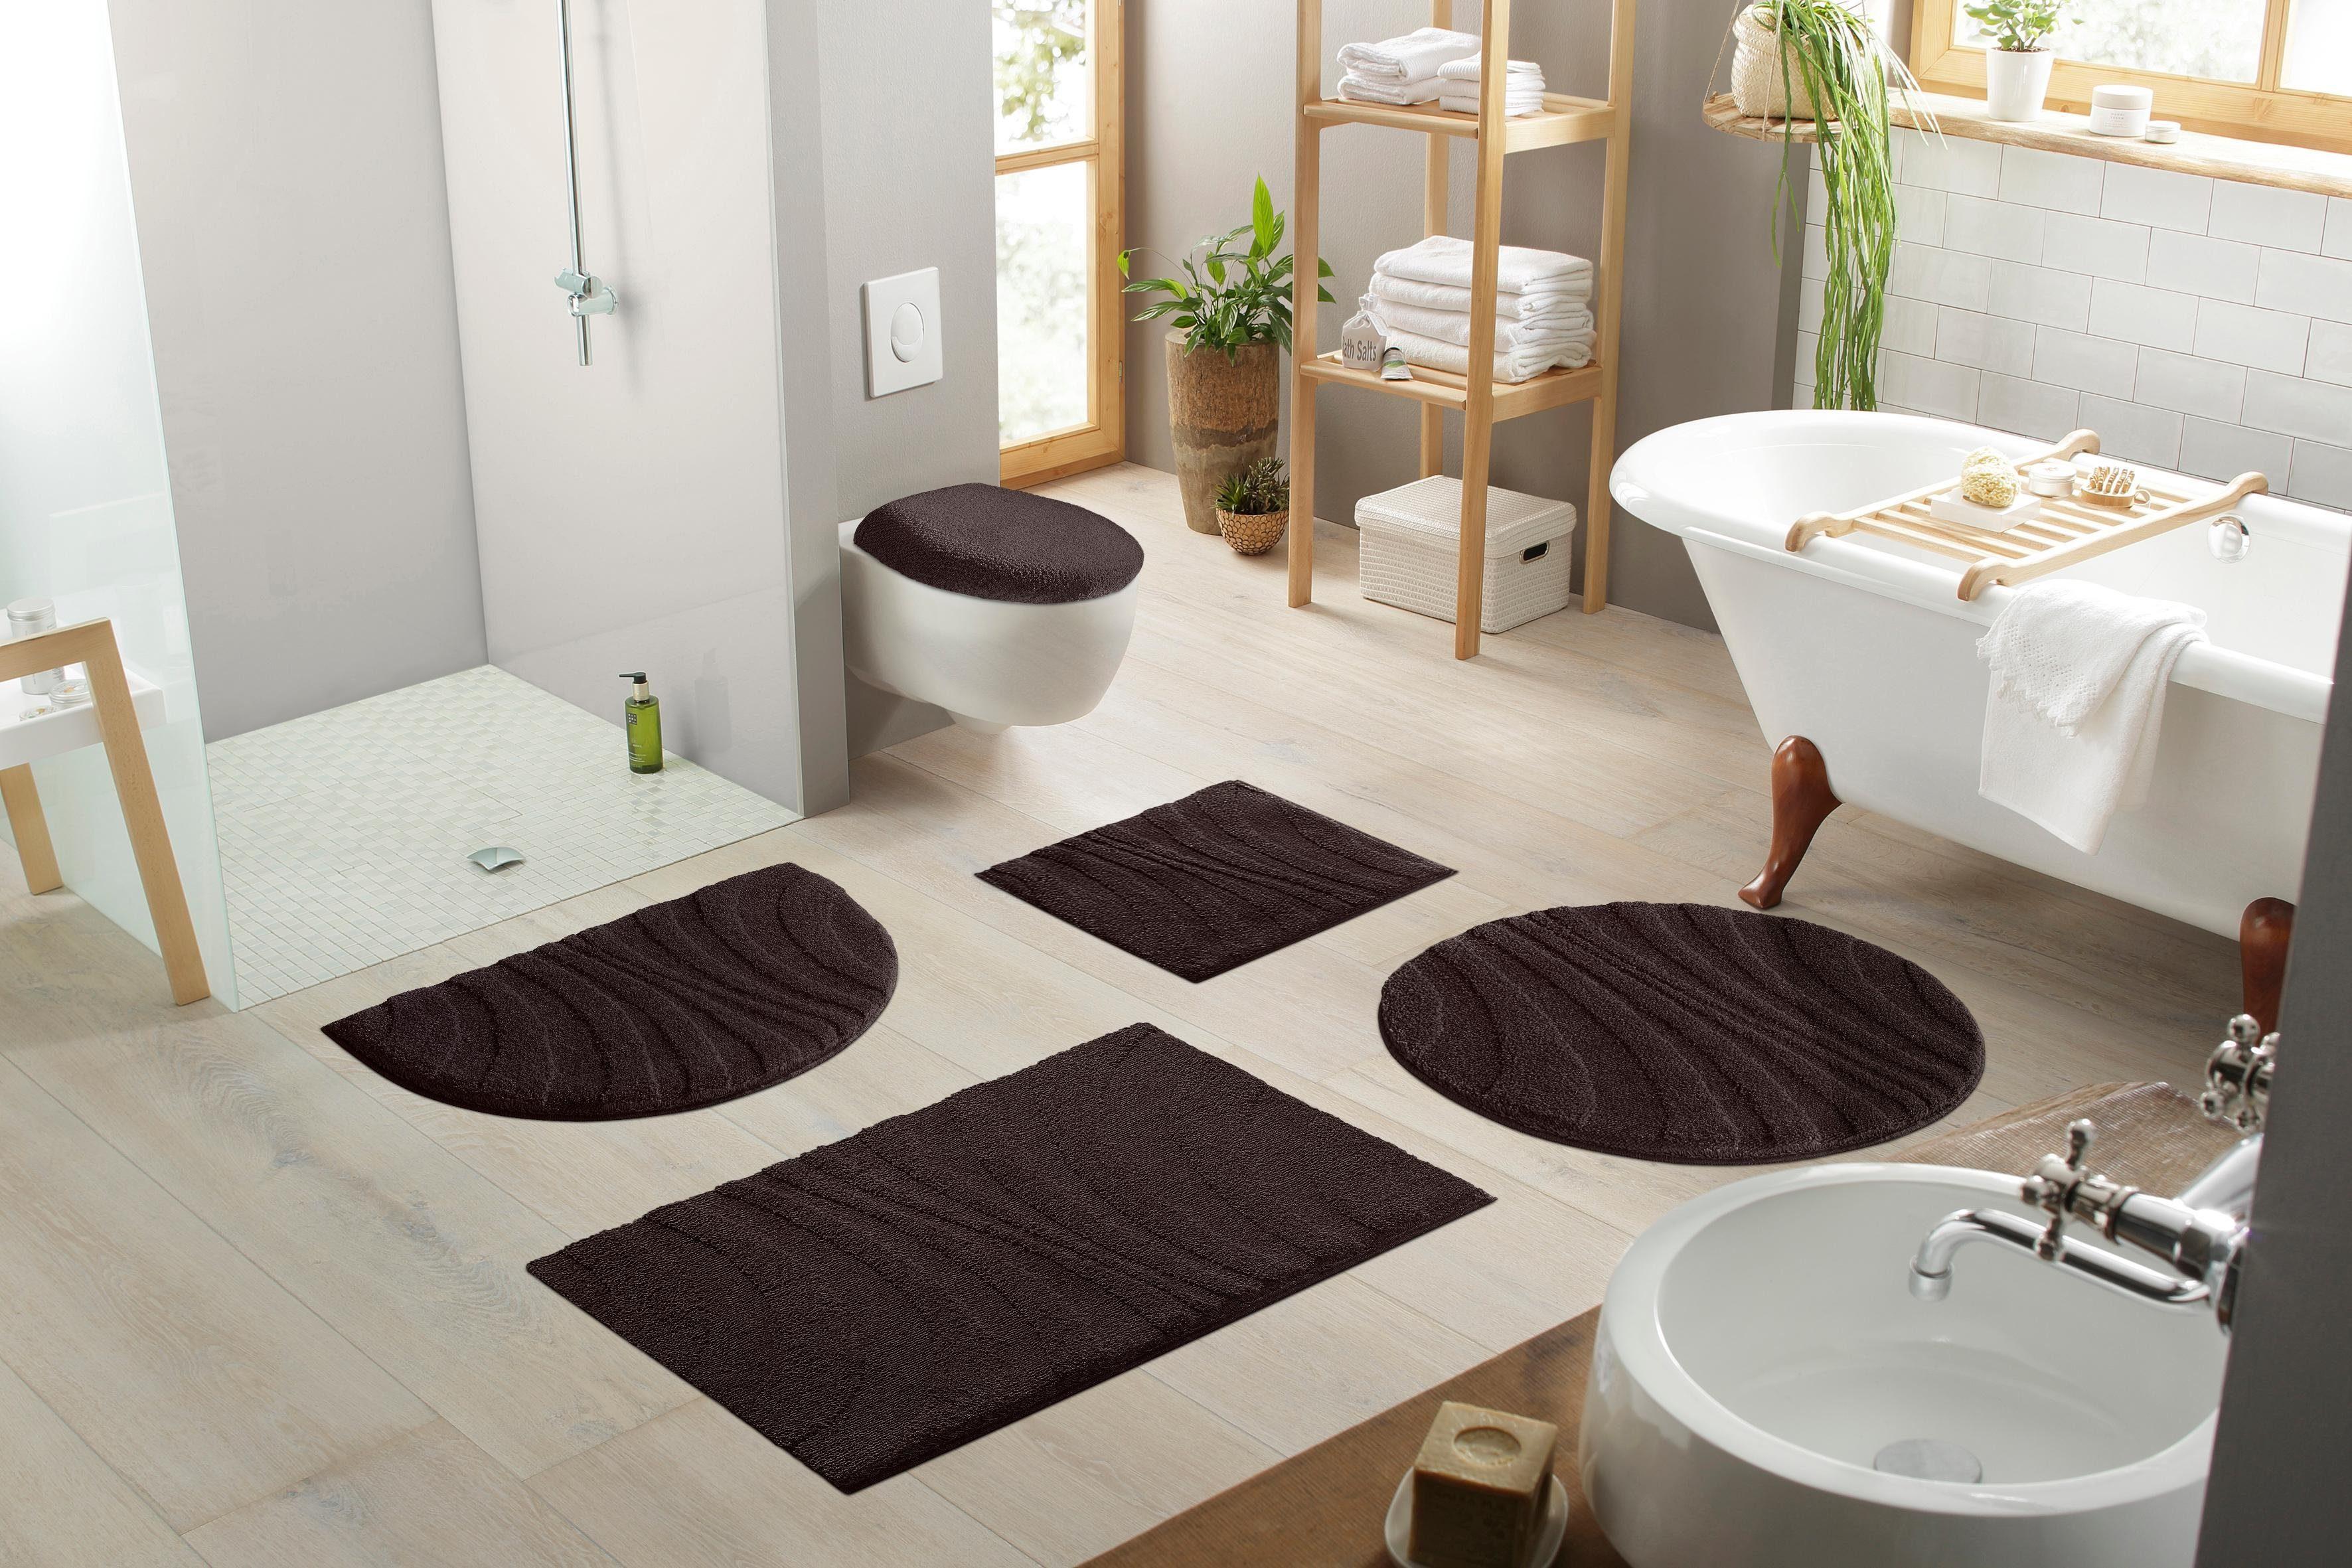 Toiletmat Hangend Toilet : Hangtoilet mat wit i mineraal i randloos rimfree sanitear